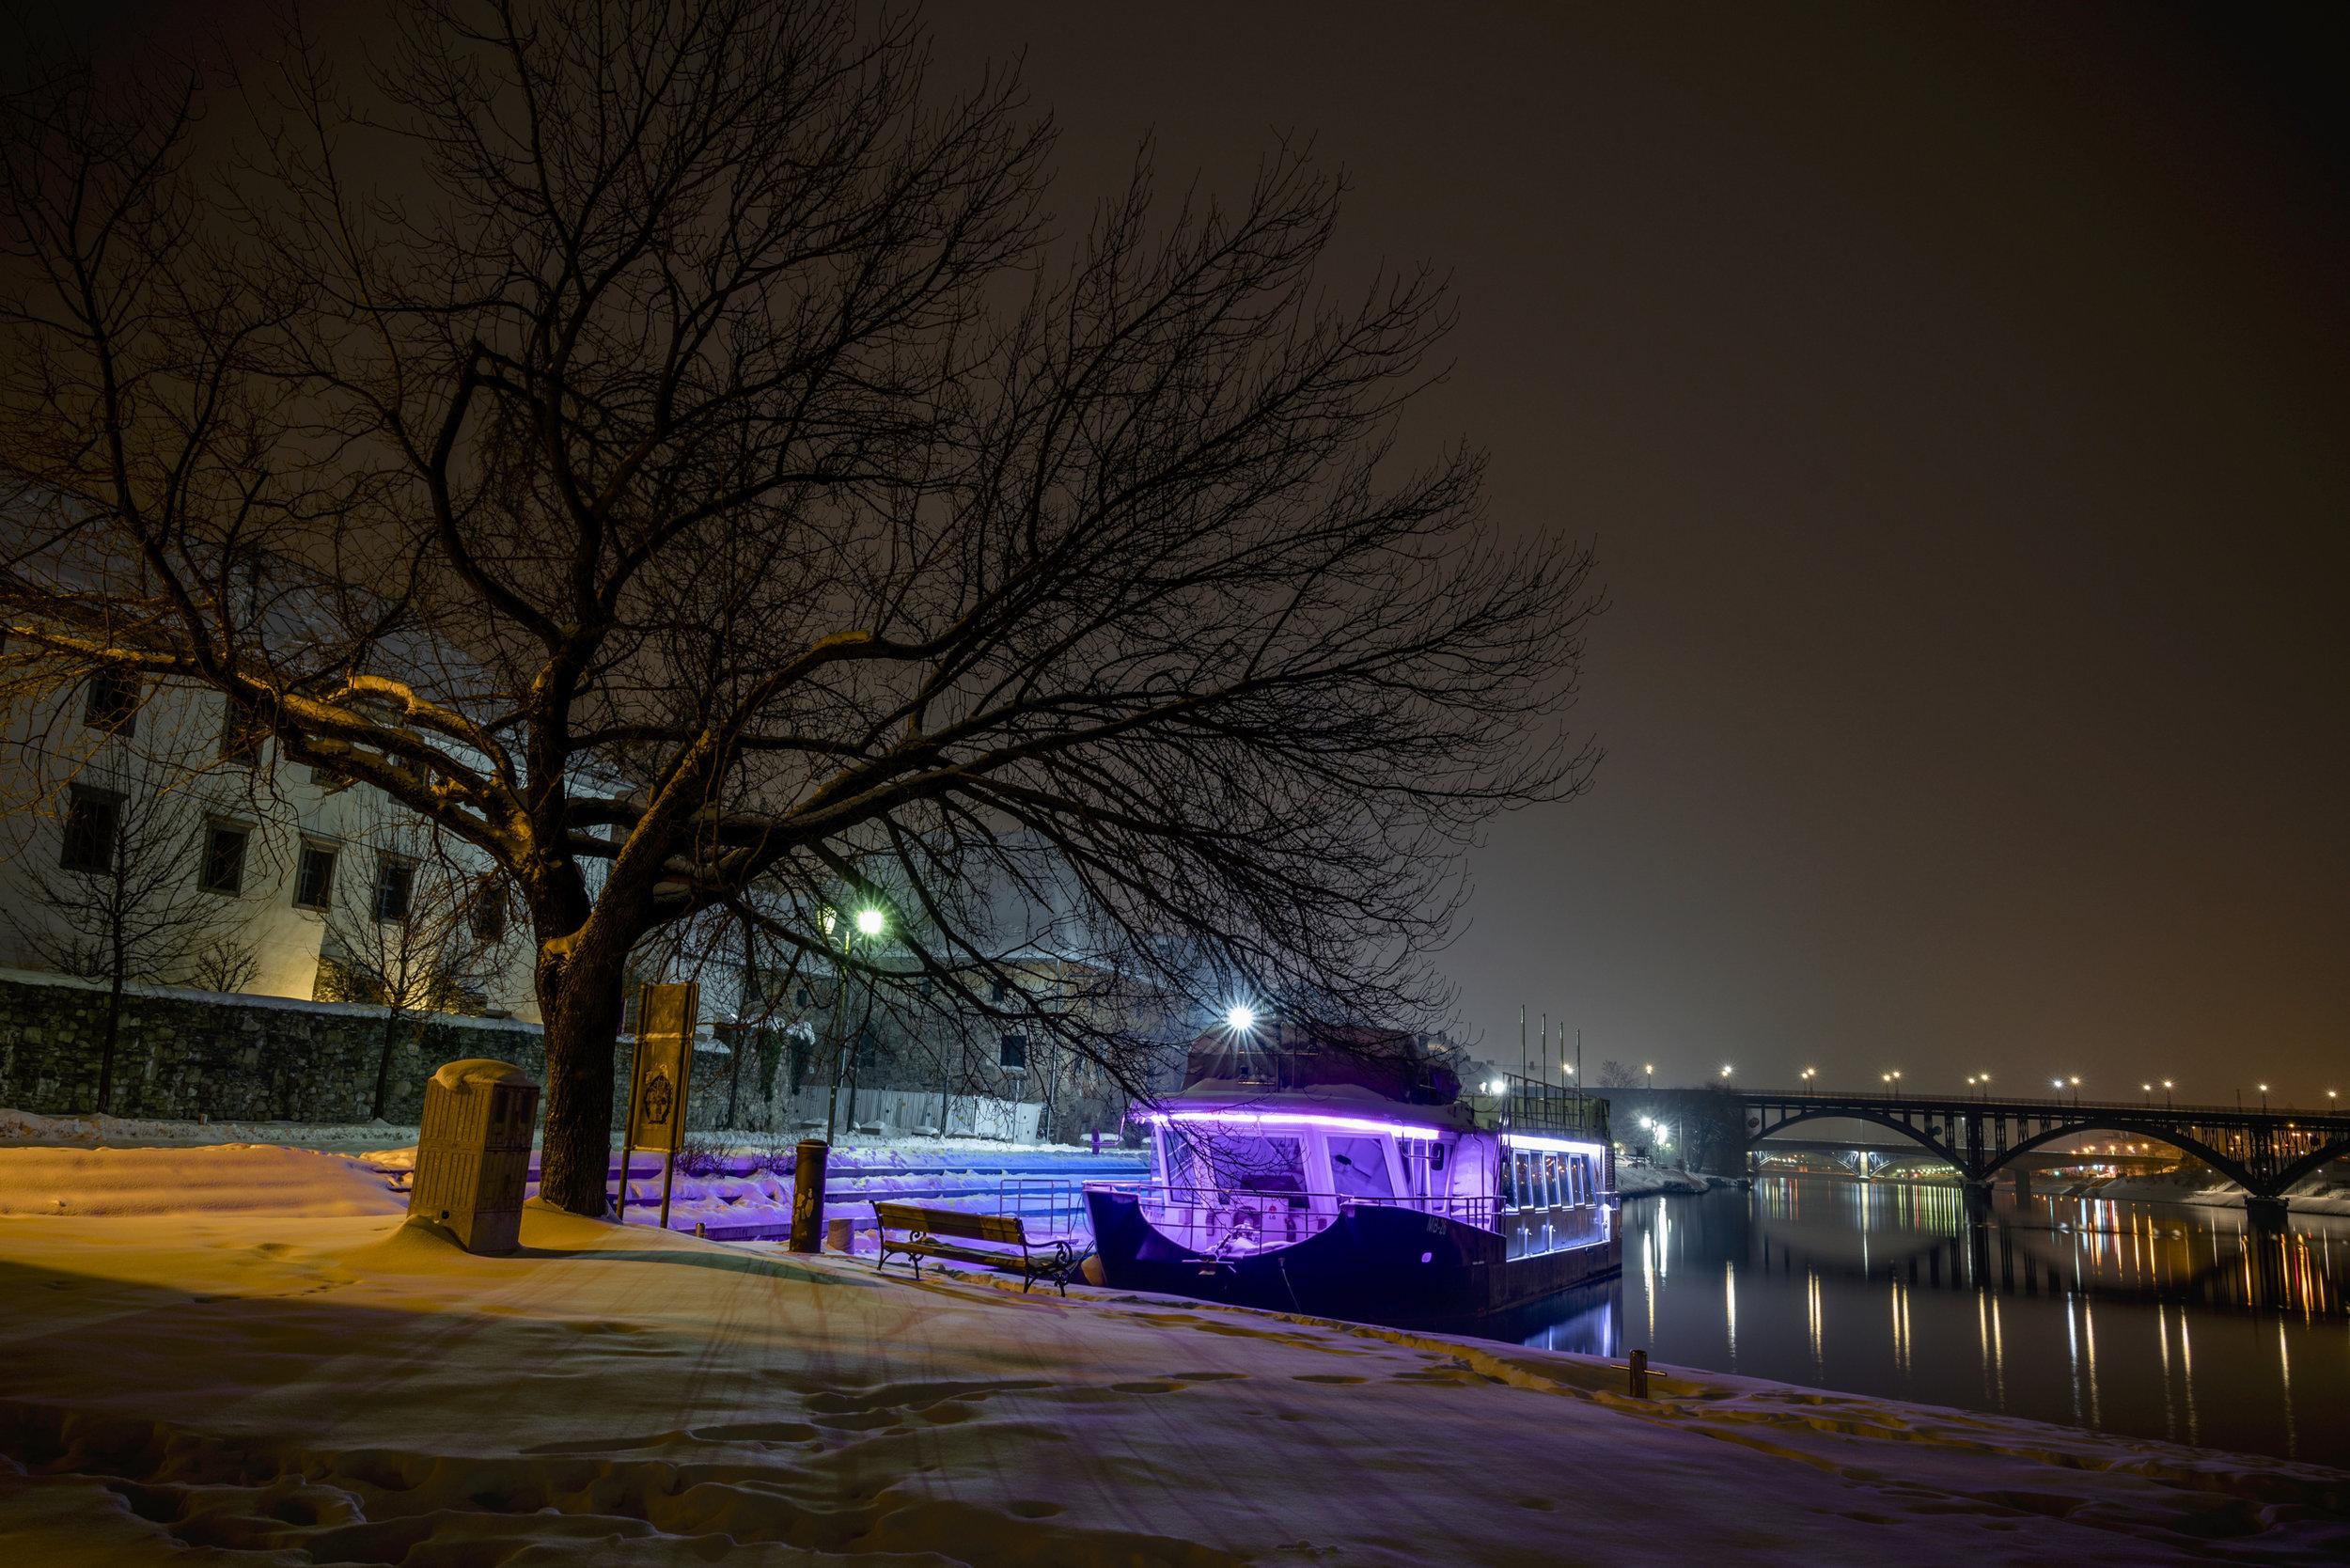 Dravska vila ; februar 2018; sony ilce7rm3; sony fe16-35